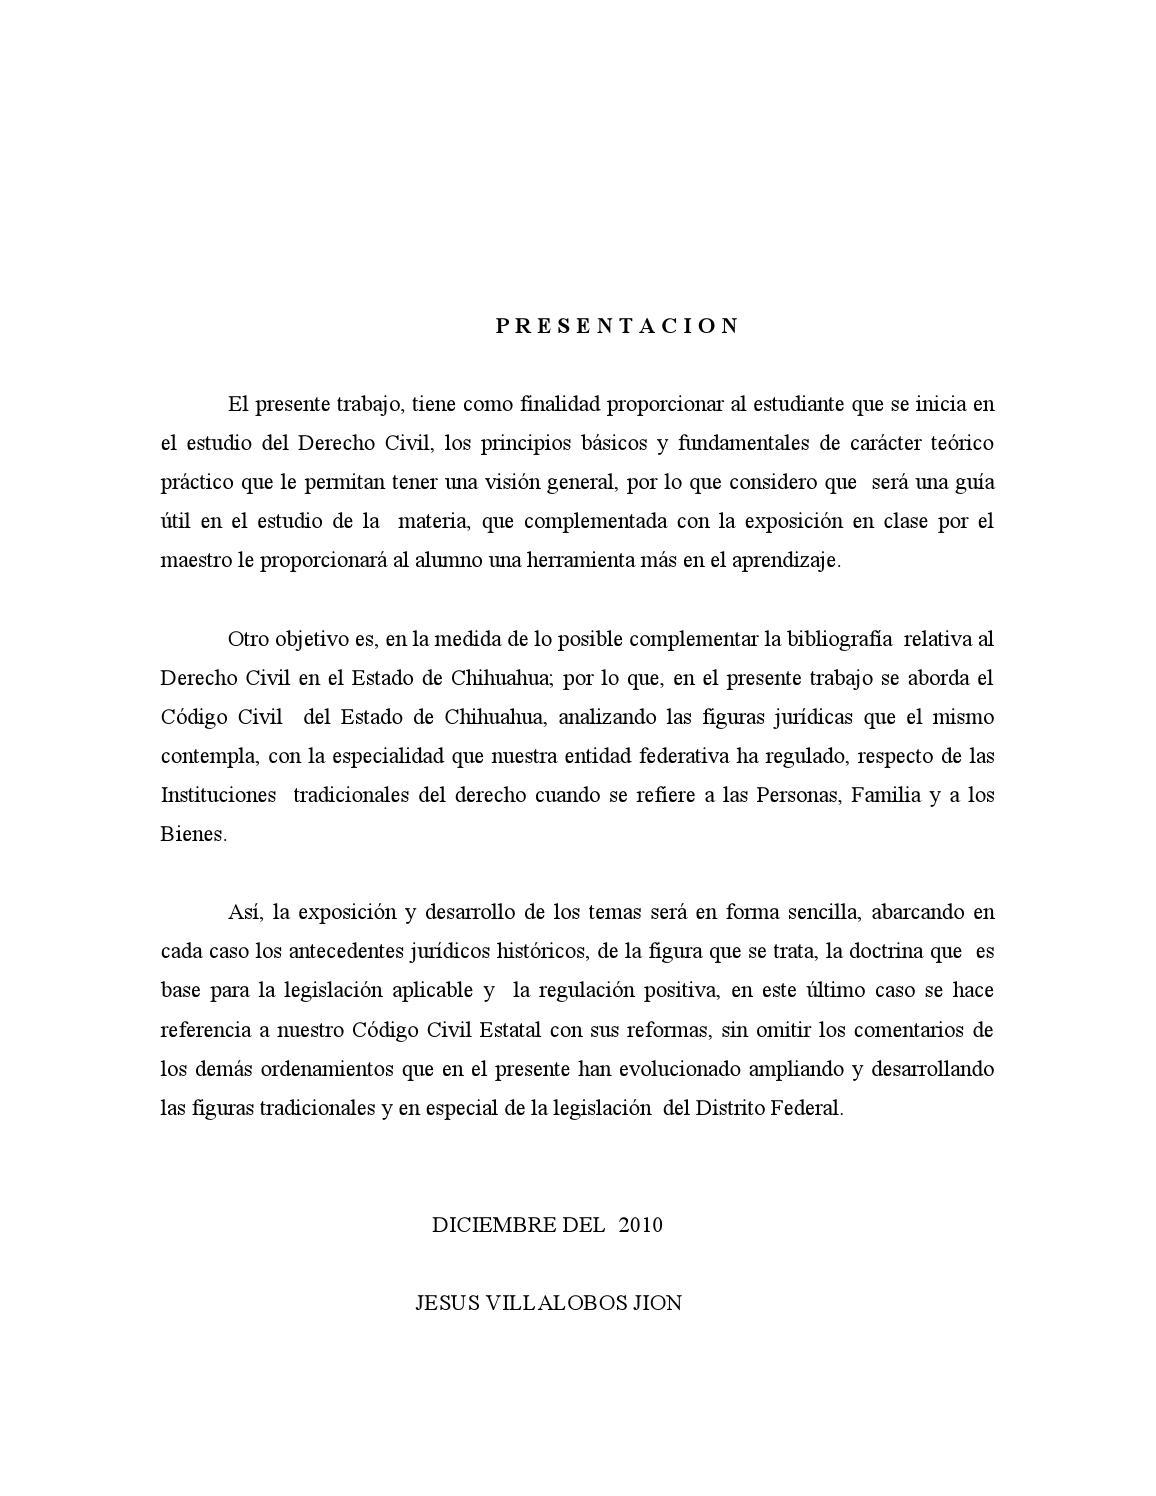 Estudio del derecho civil by hiram rios juarez issuu for Concepto de familia pdf